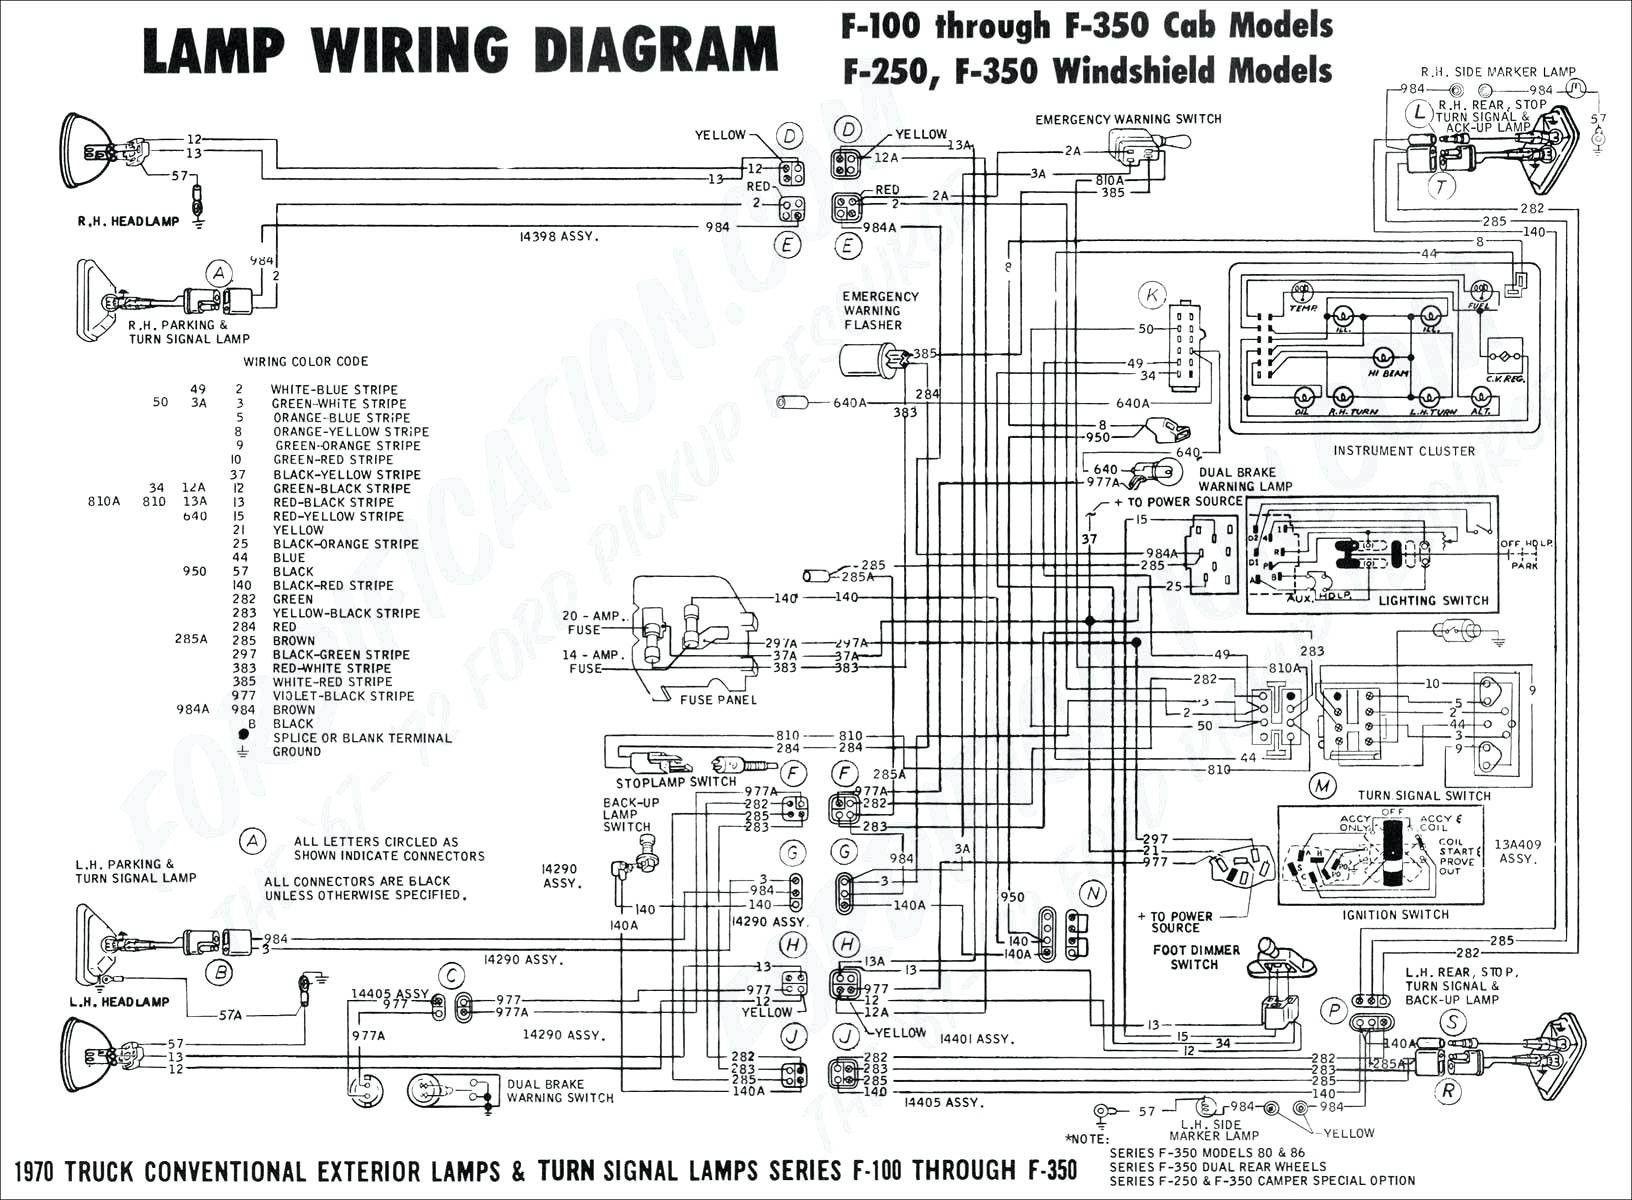 John Deere Gator Ignition Diagram Winnebago Itasca Wiring Diagram for Trailer Auto Of John Deere Gator Ignition Diagram